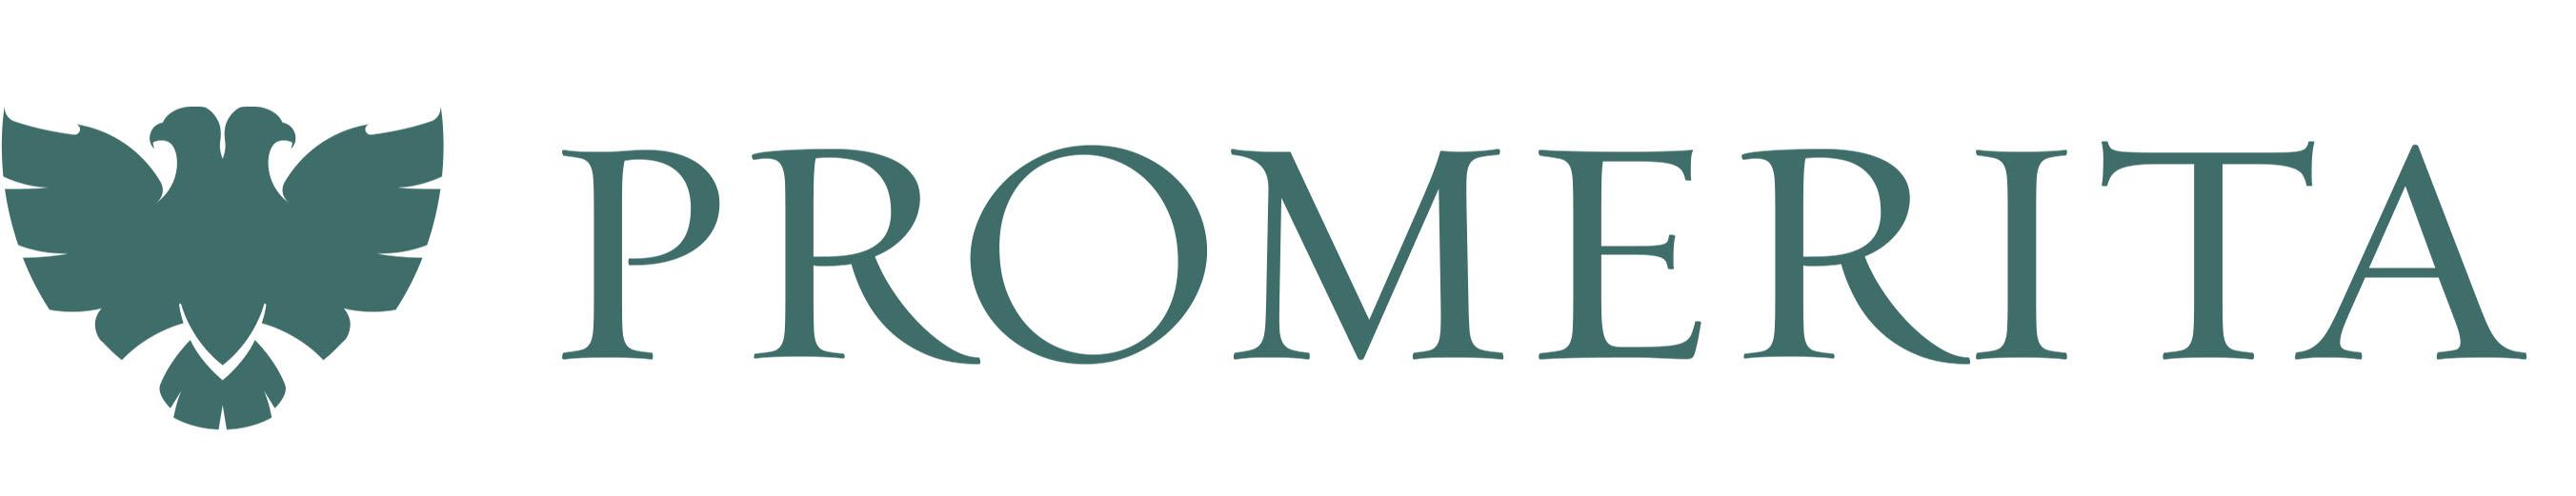 promerita logo   editable  horizontal a